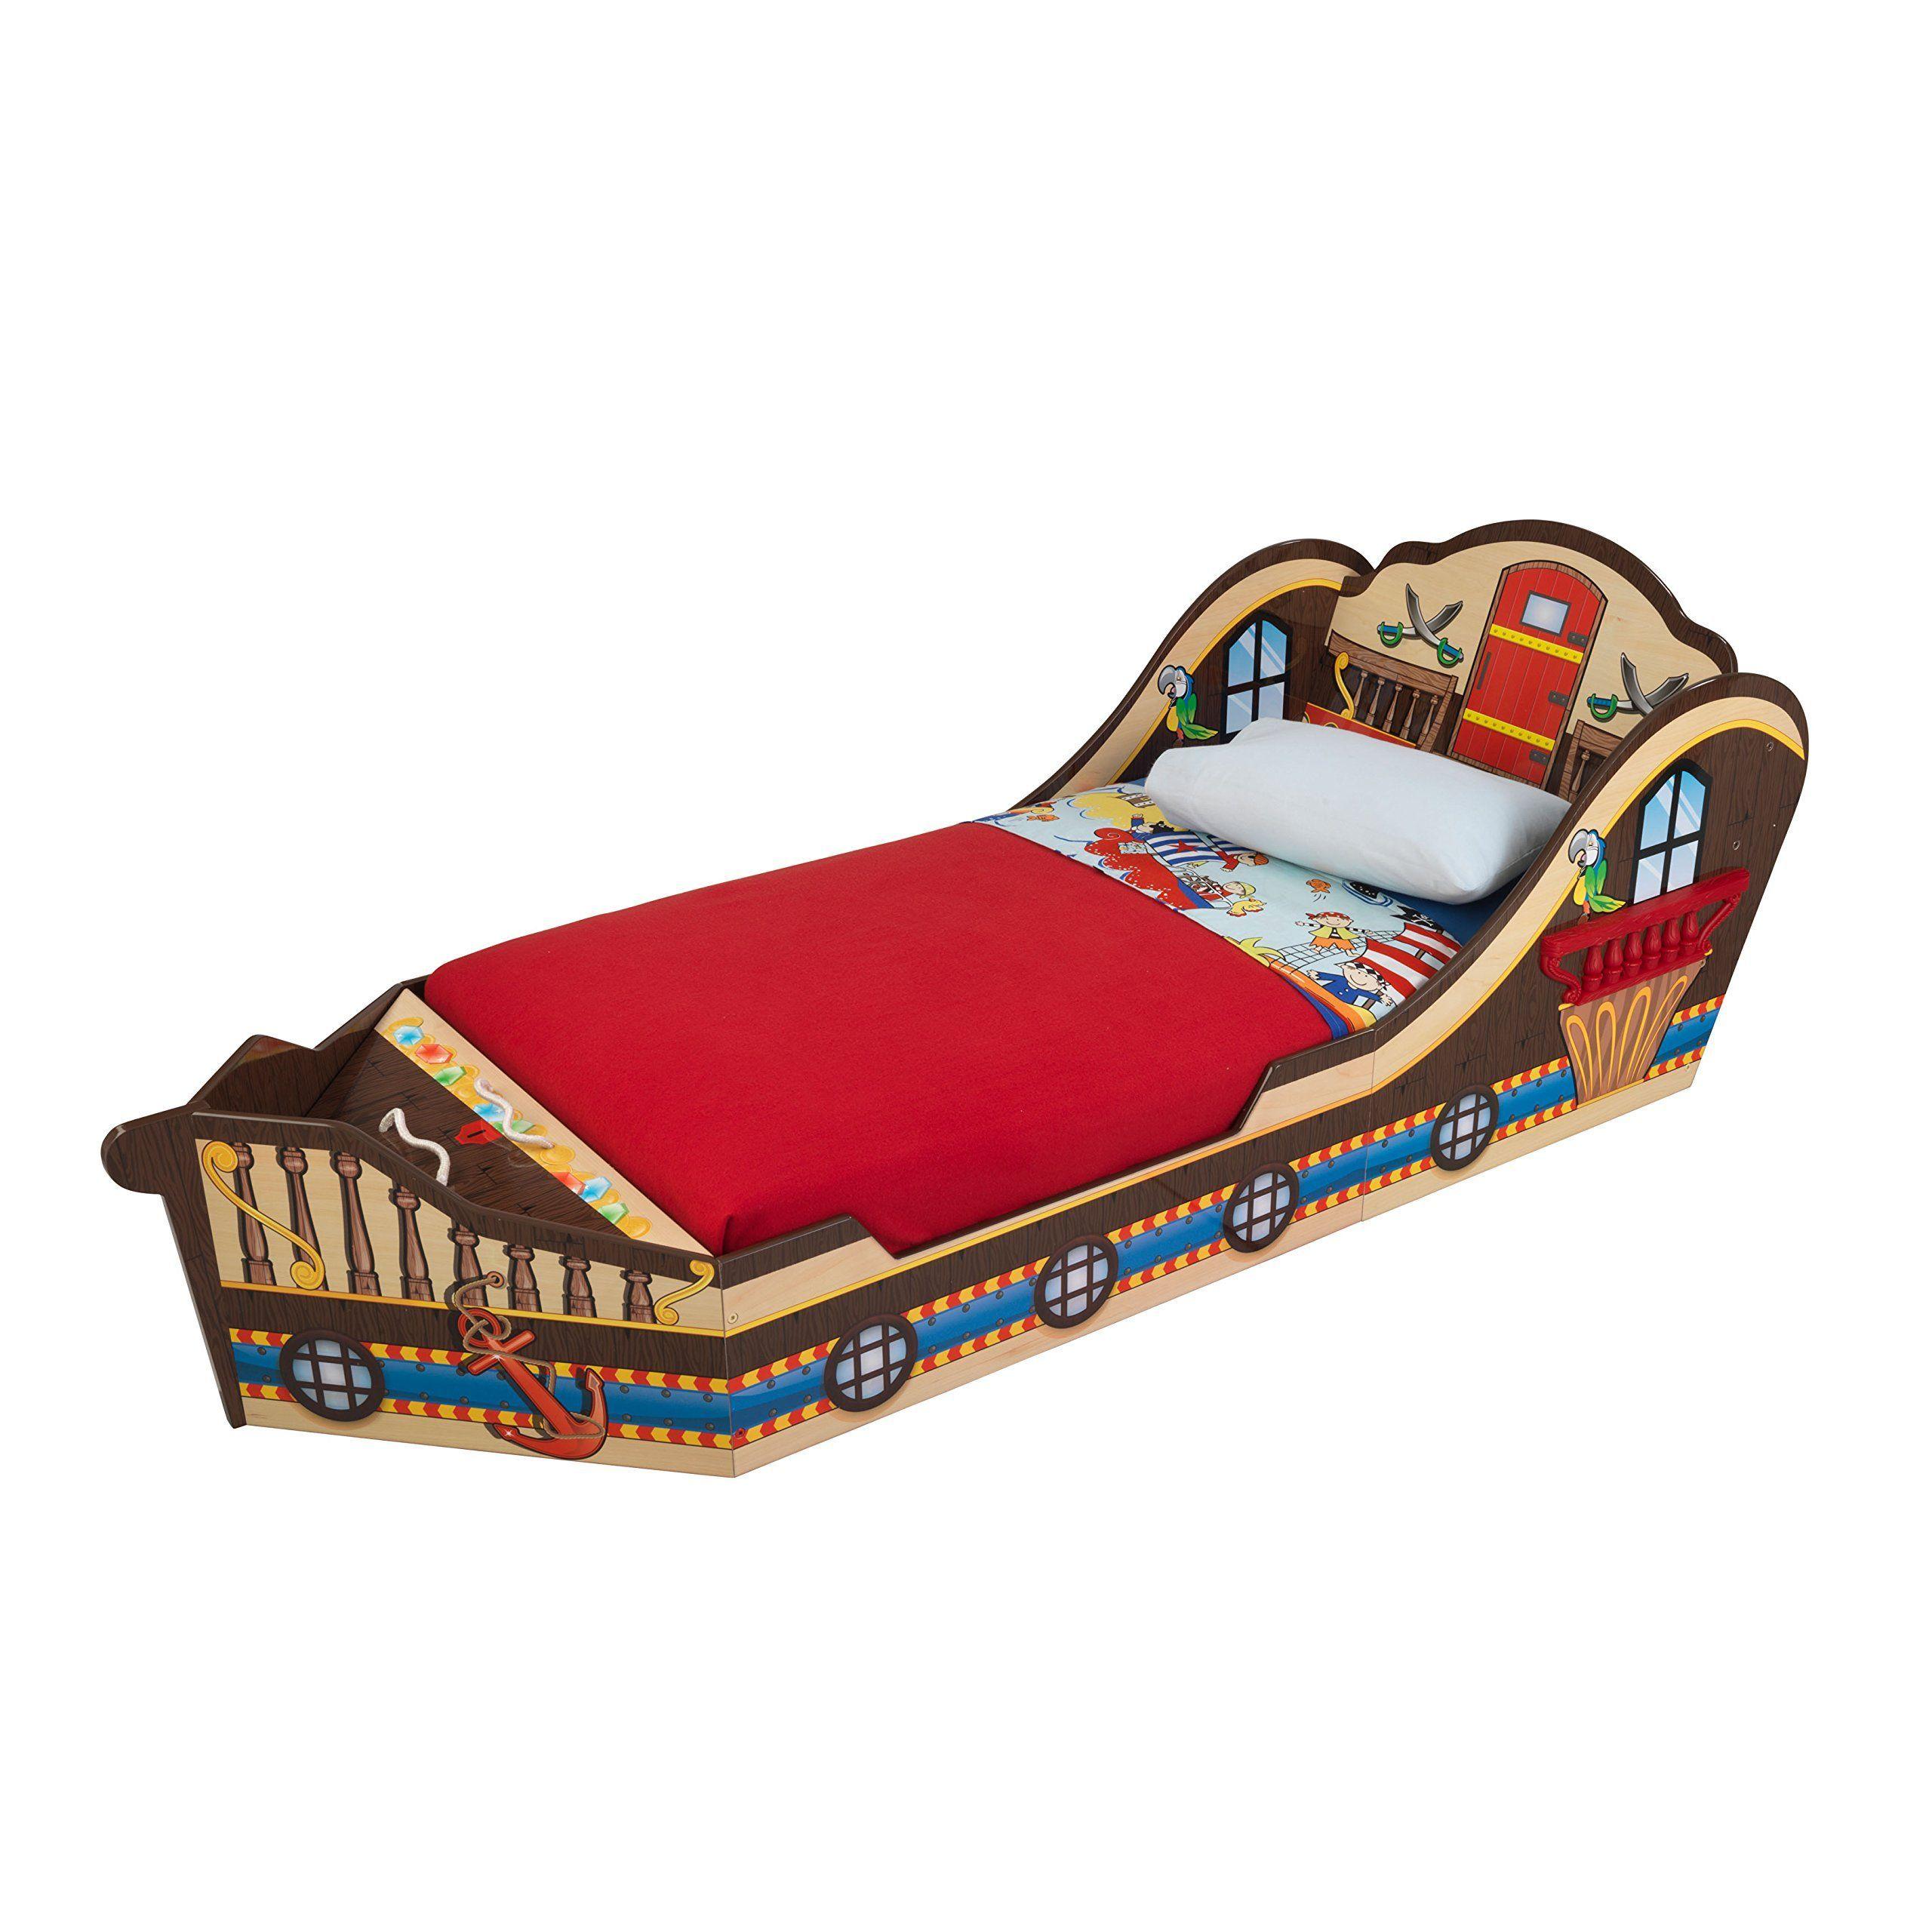 "KidKraft Toddler Pirate Bed. 72.5""L x 32""W x 20.25""H"